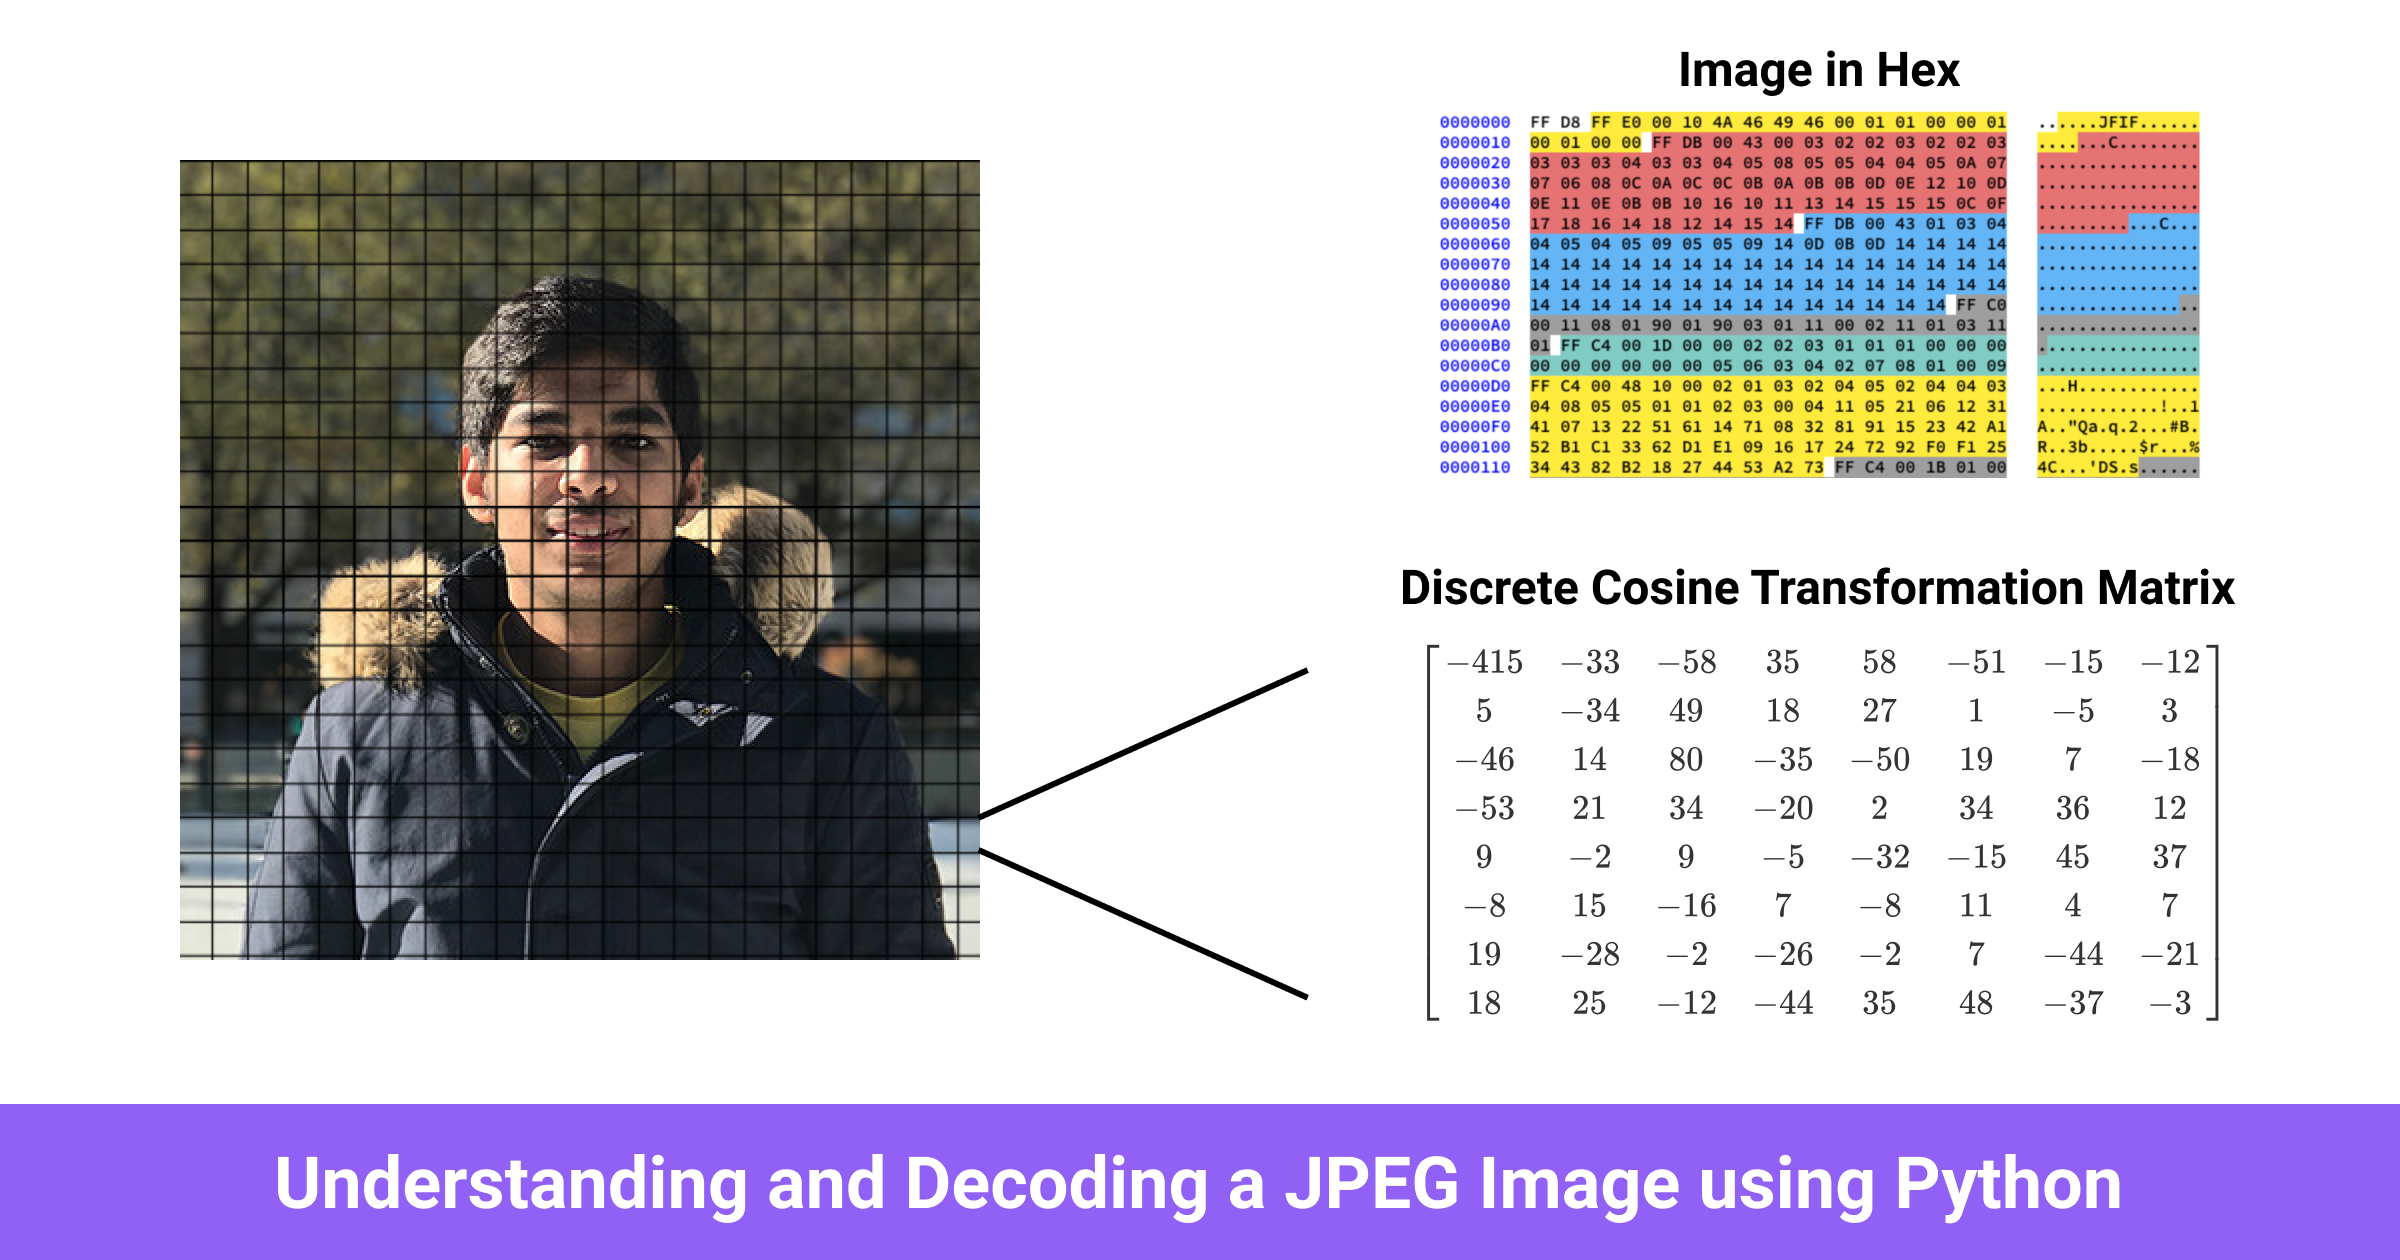 Understanding and Decoding a JPEG Image using Python